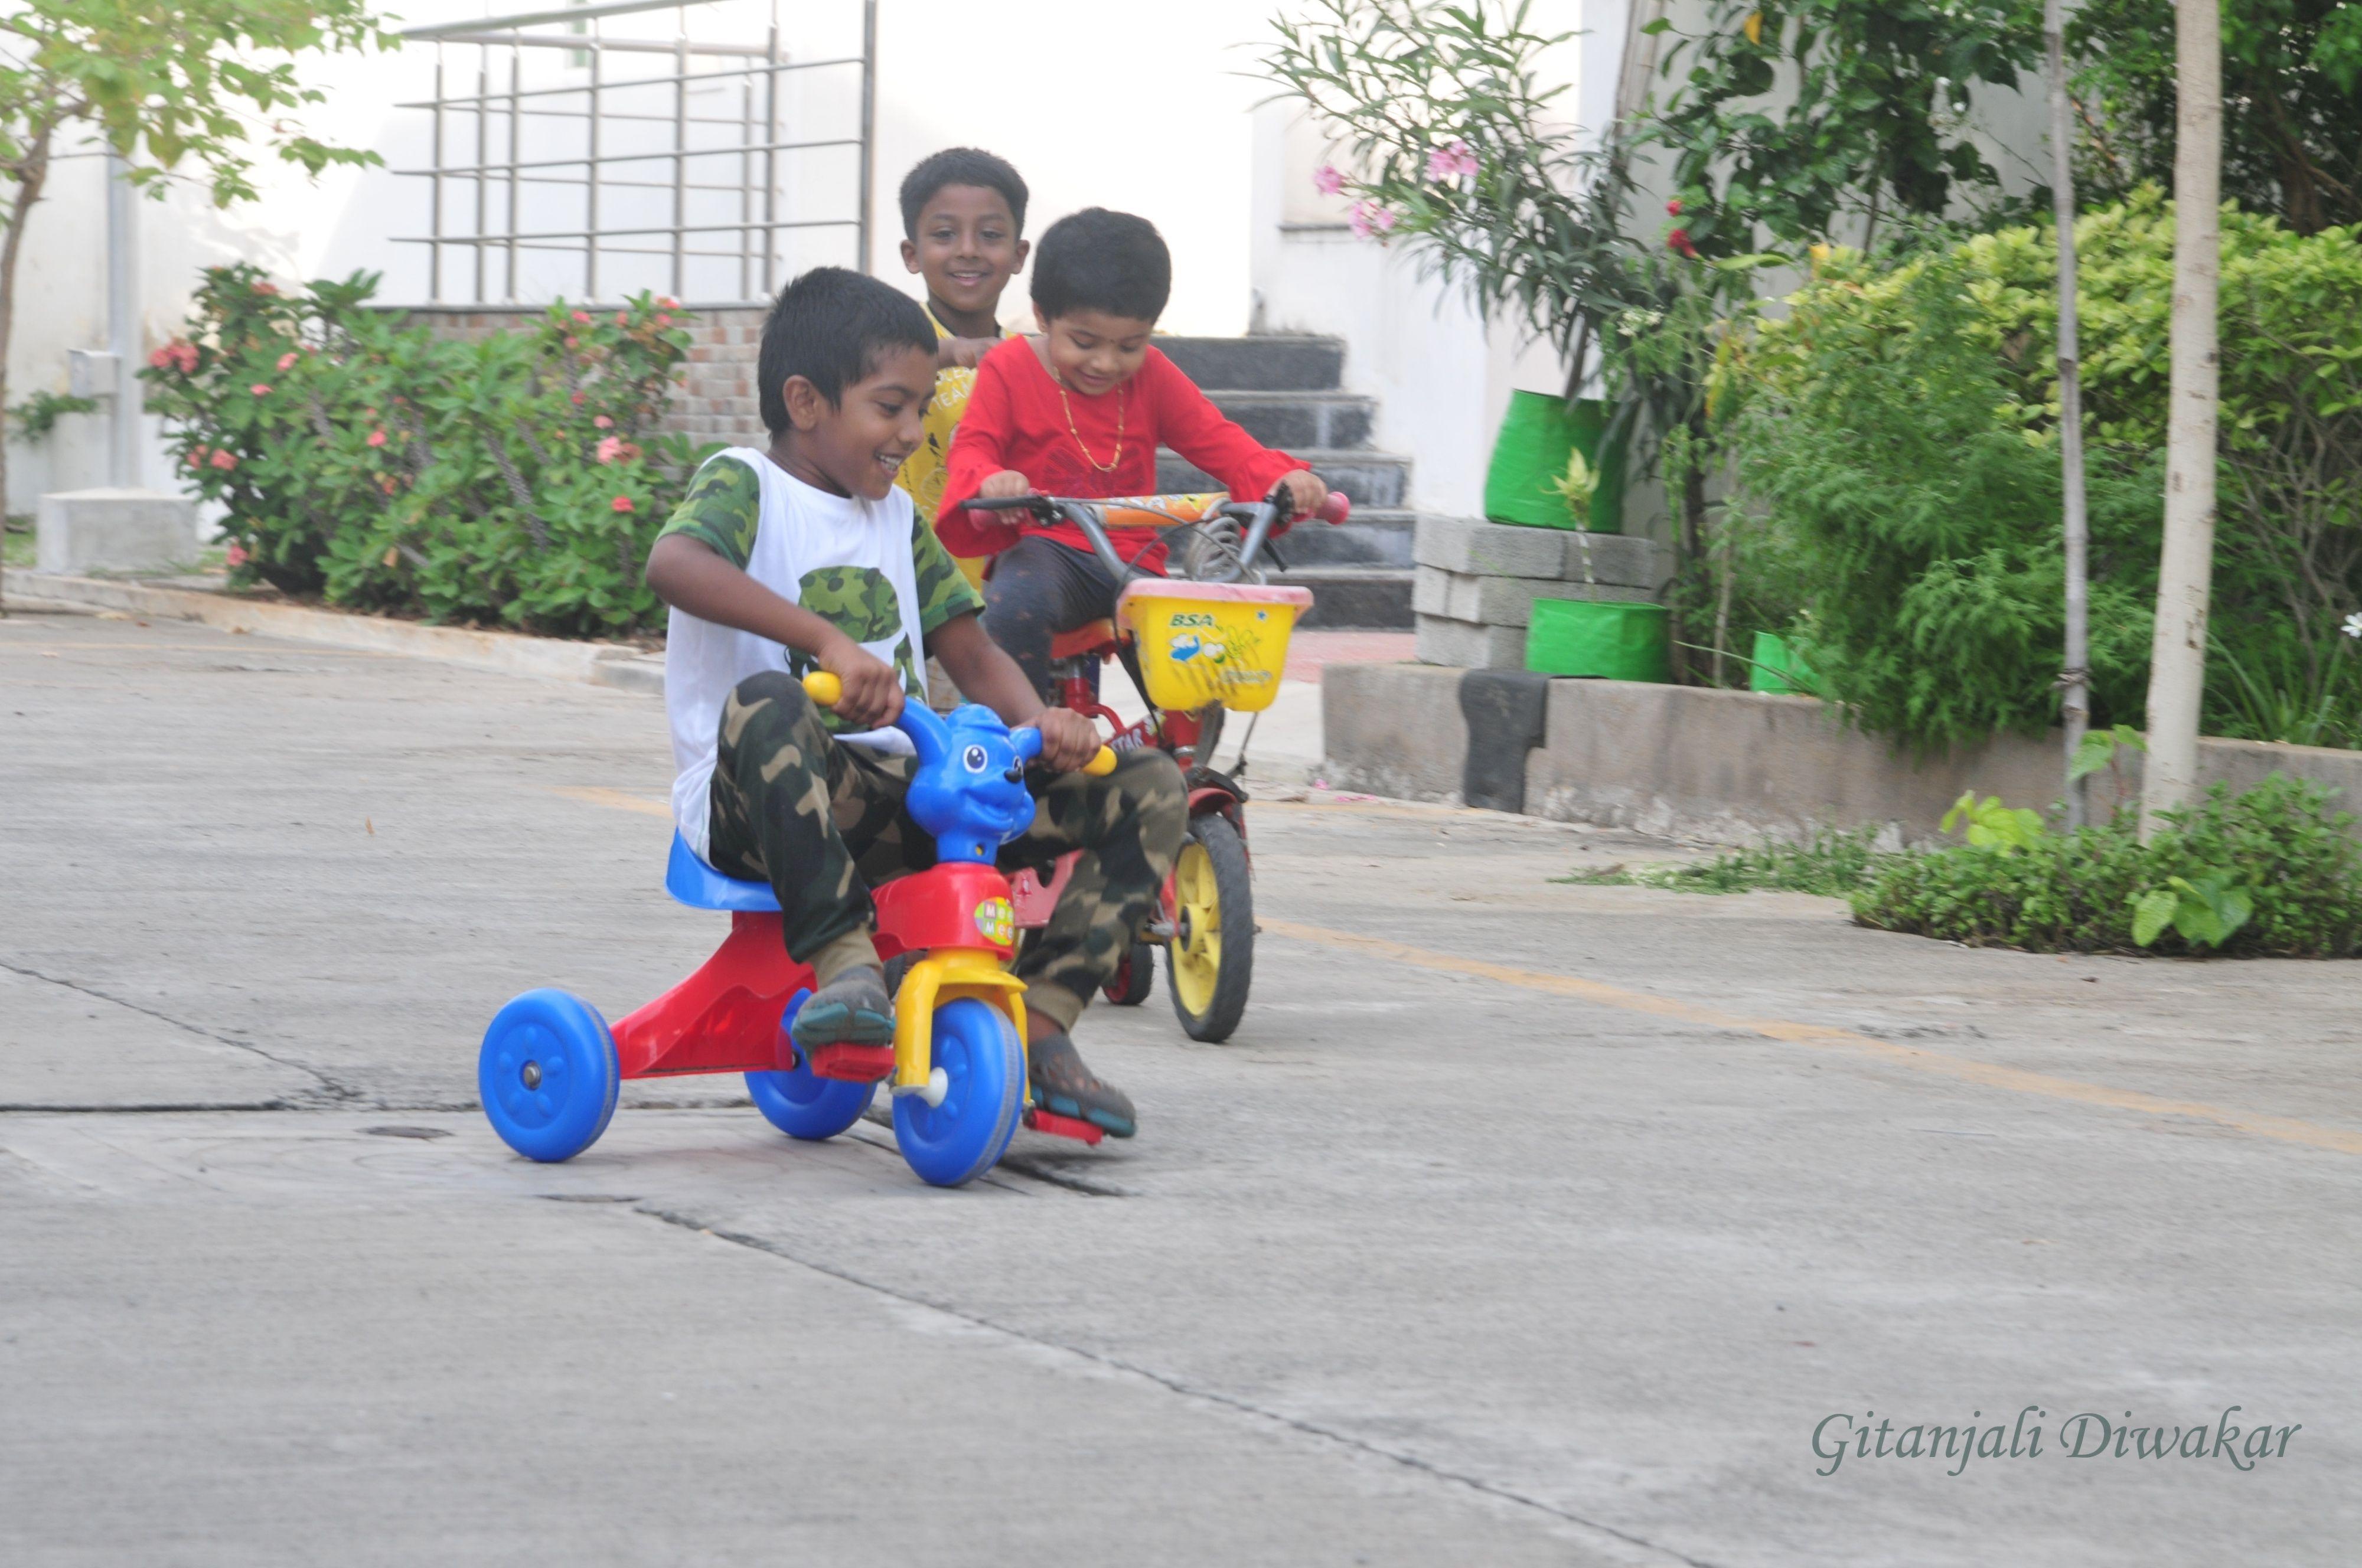 Children's photography - in Navalur, Kanchipuram, Tamil Nadu, India